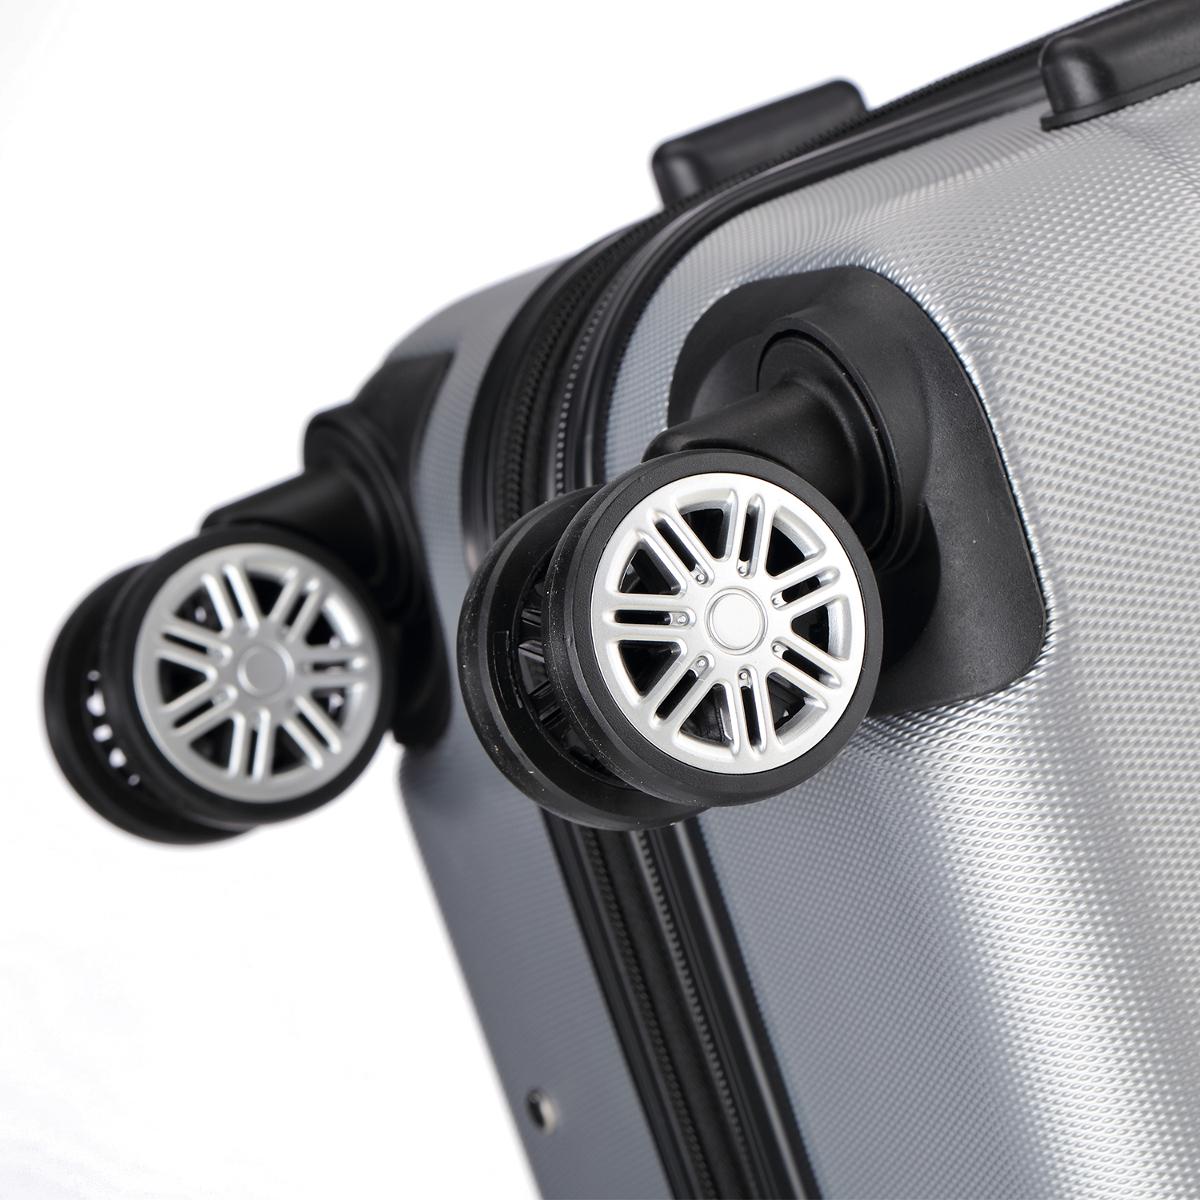 Koffer-Flexot-2045-Hartschalenkoffer-Trolley-Kofferset-Reisekoffer-M-L-XL-Set Indexbild 79